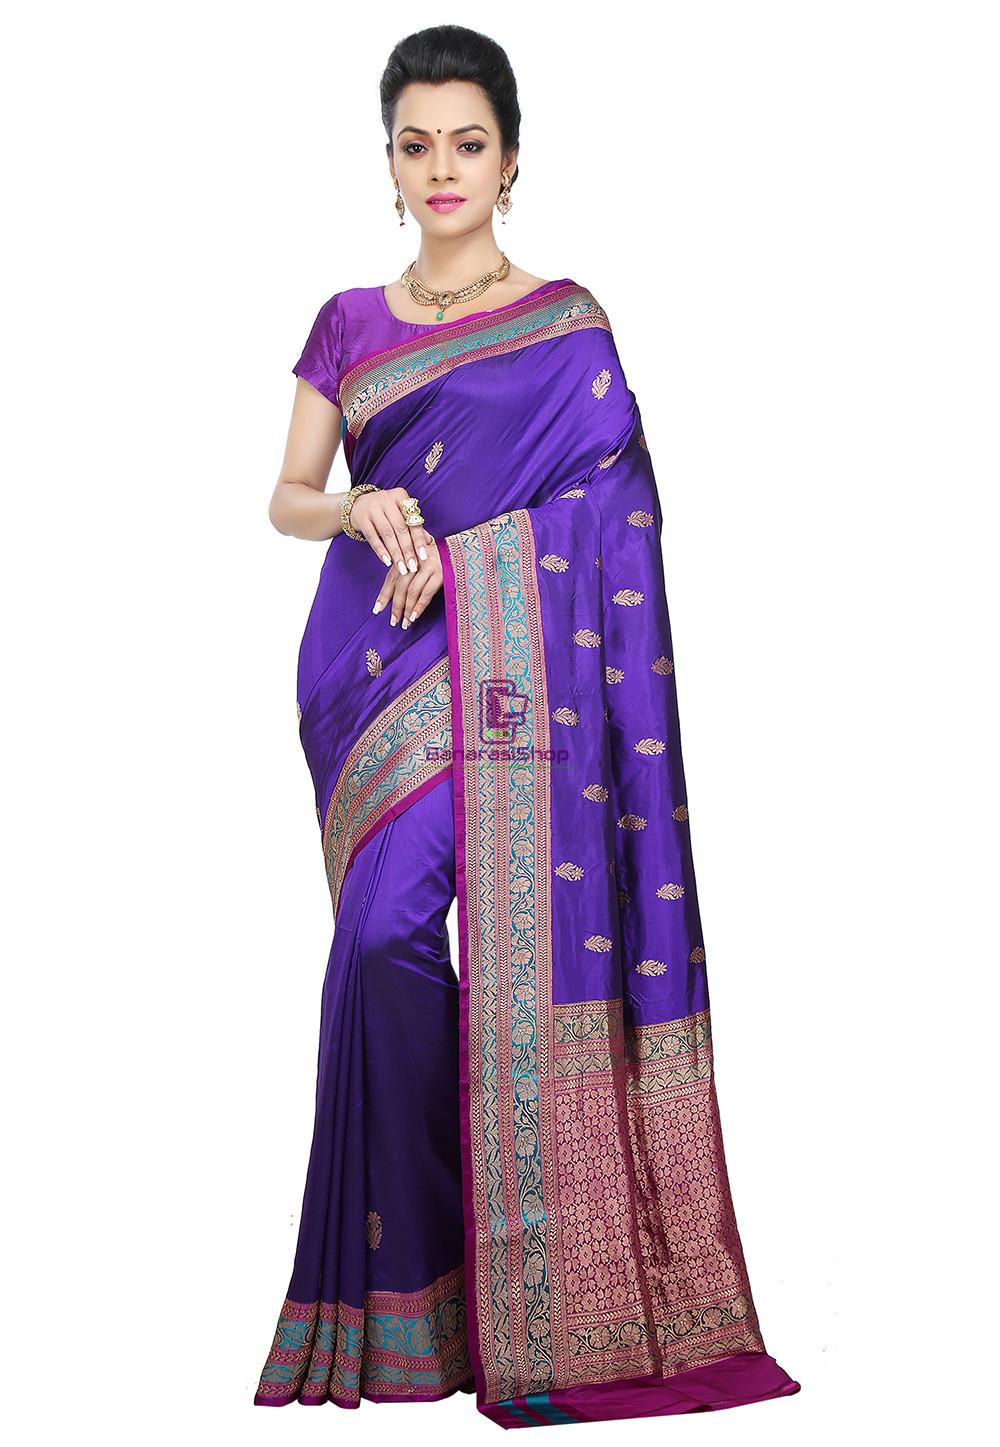 Banarasi Pure Katan Silk Handloom Saree in Indigo 1